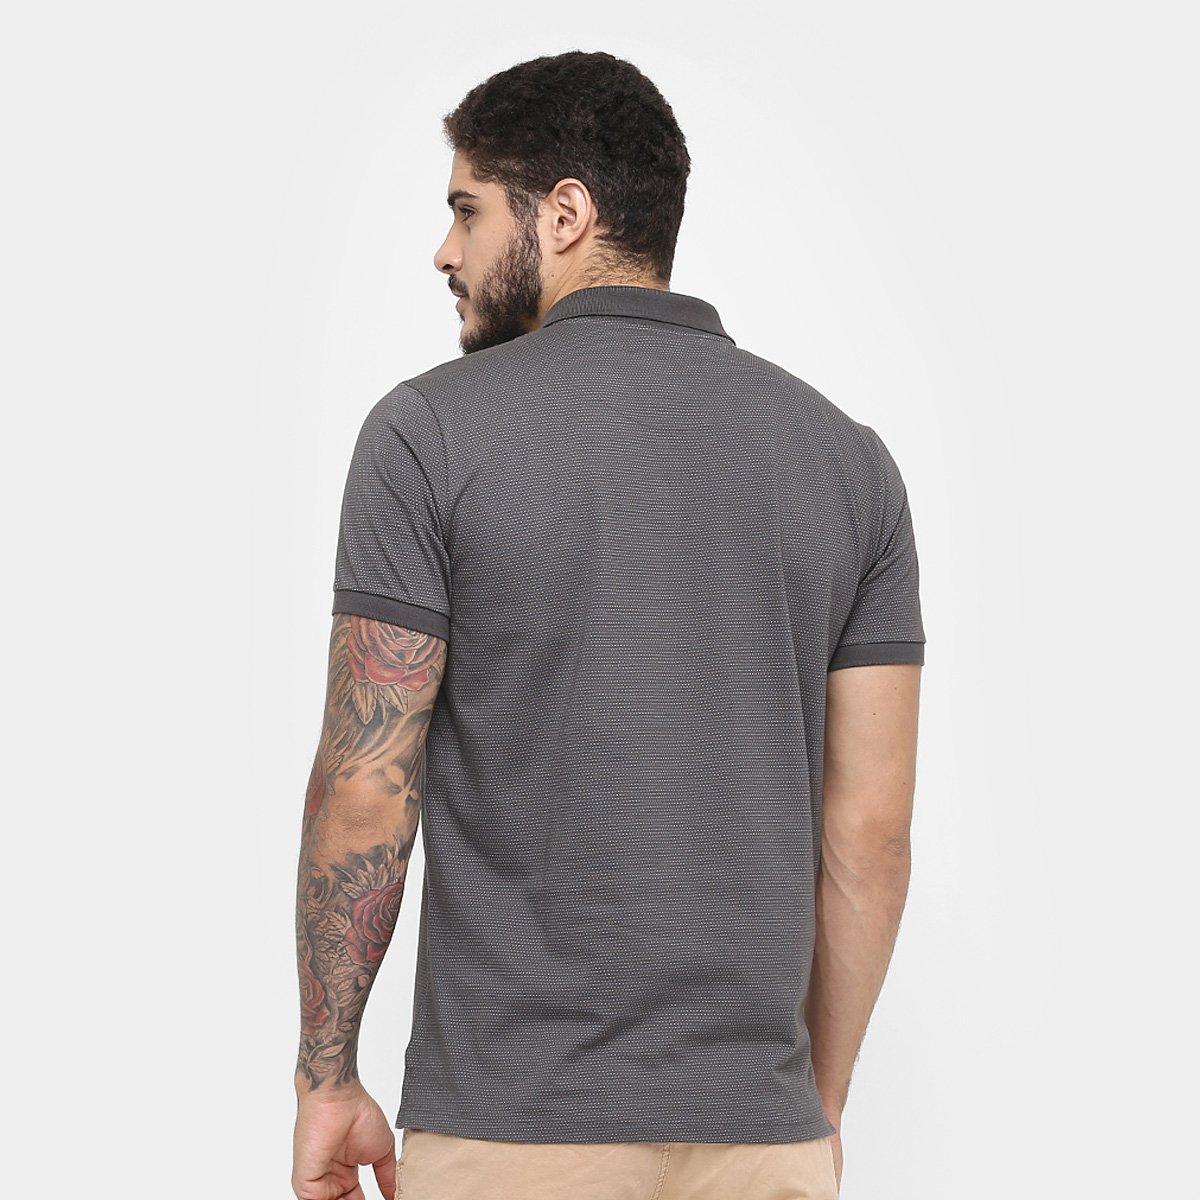 Camisa Polo Reserva Malha Poá MIni - Compre Agora  c939cf4935773